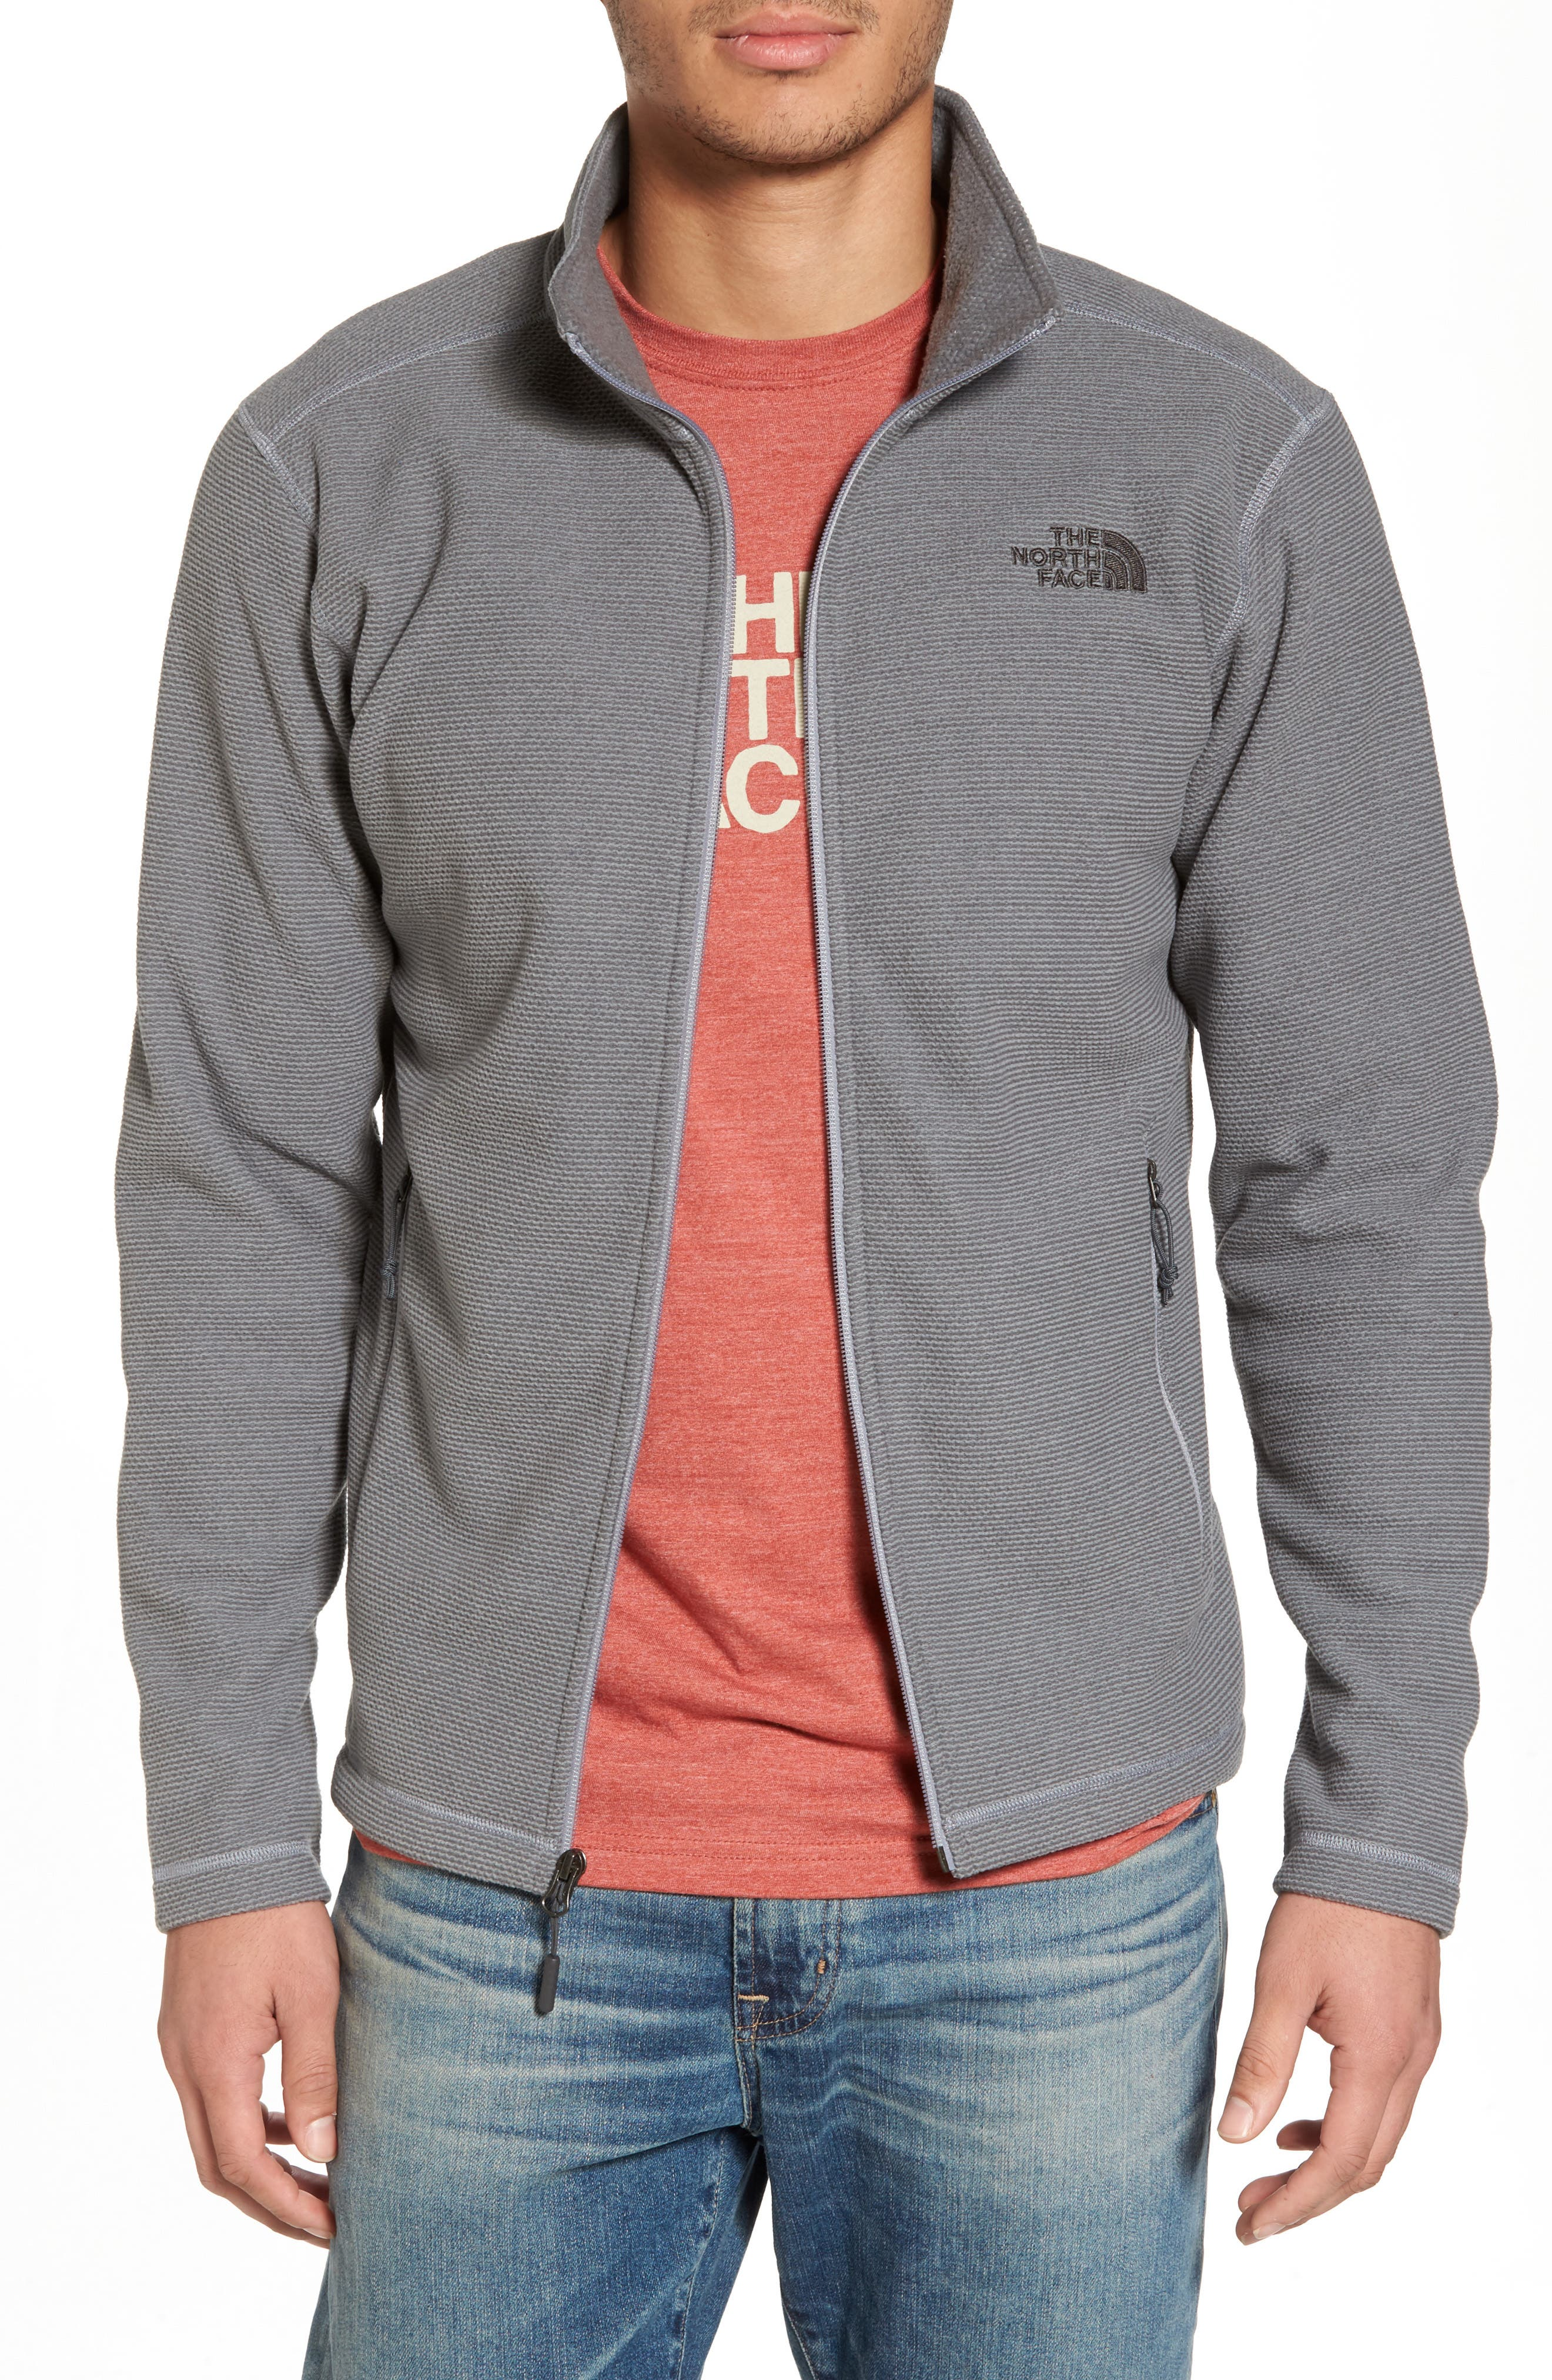 Main Image - The North Face Cap Rock Fleece Jacket